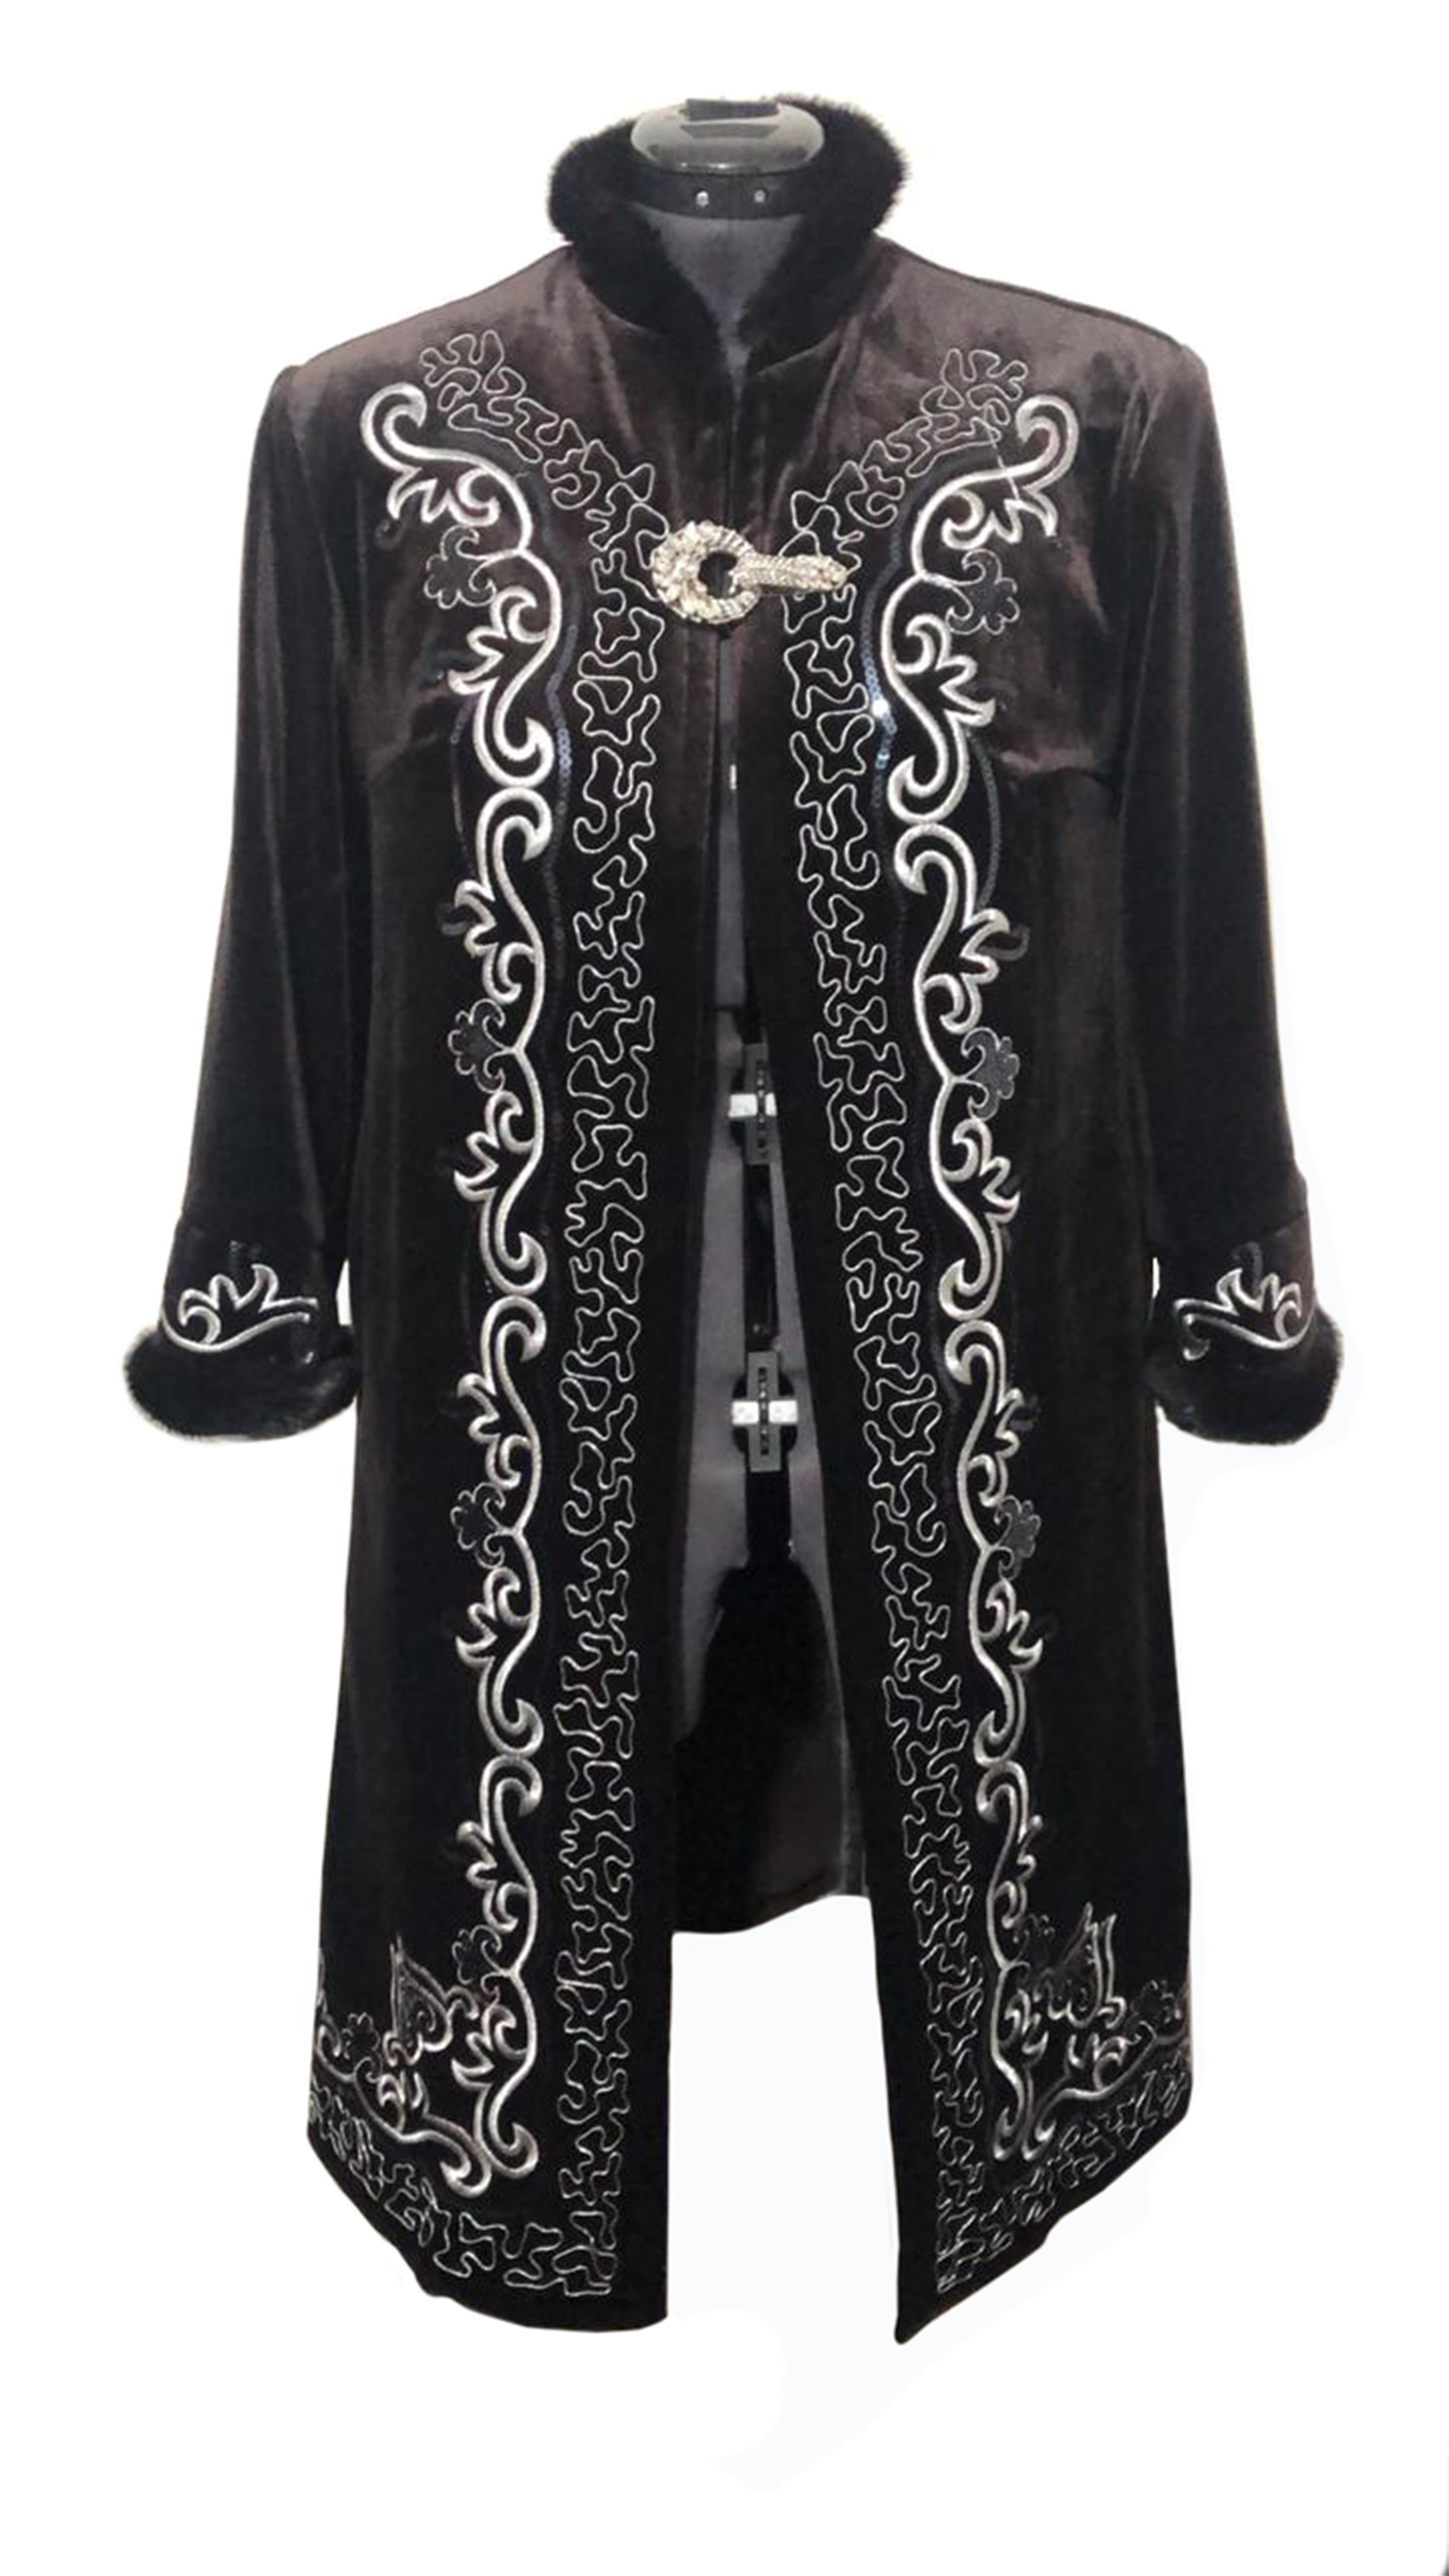 Kazakhstan Garment National Overcoat Clothes Long Sleeve Female Beshmet